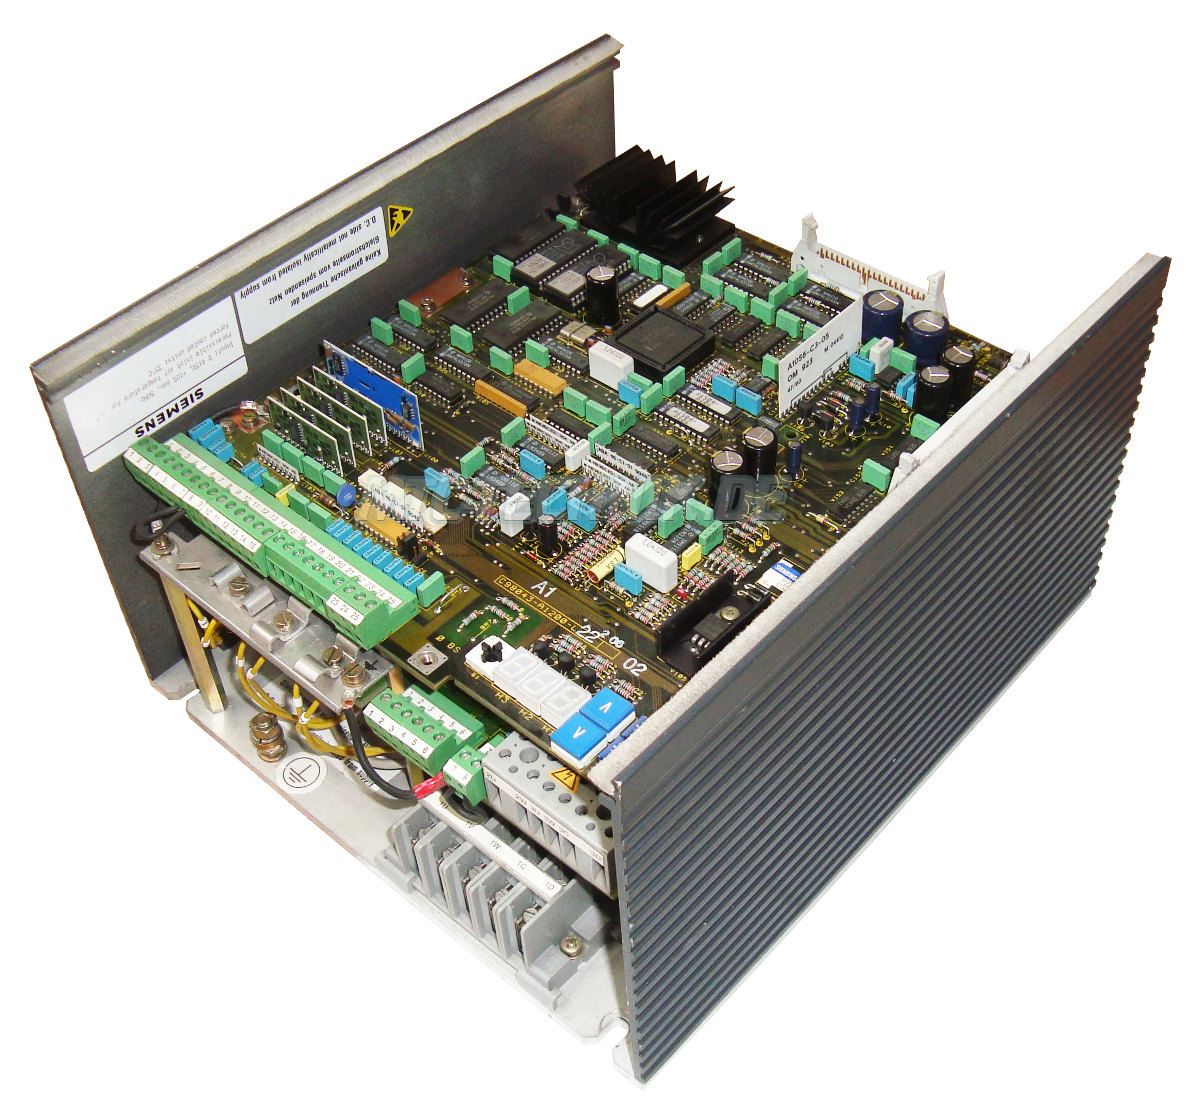 3 Bestellen 6ra2218-6ds22-0 Artikel Online Siemens